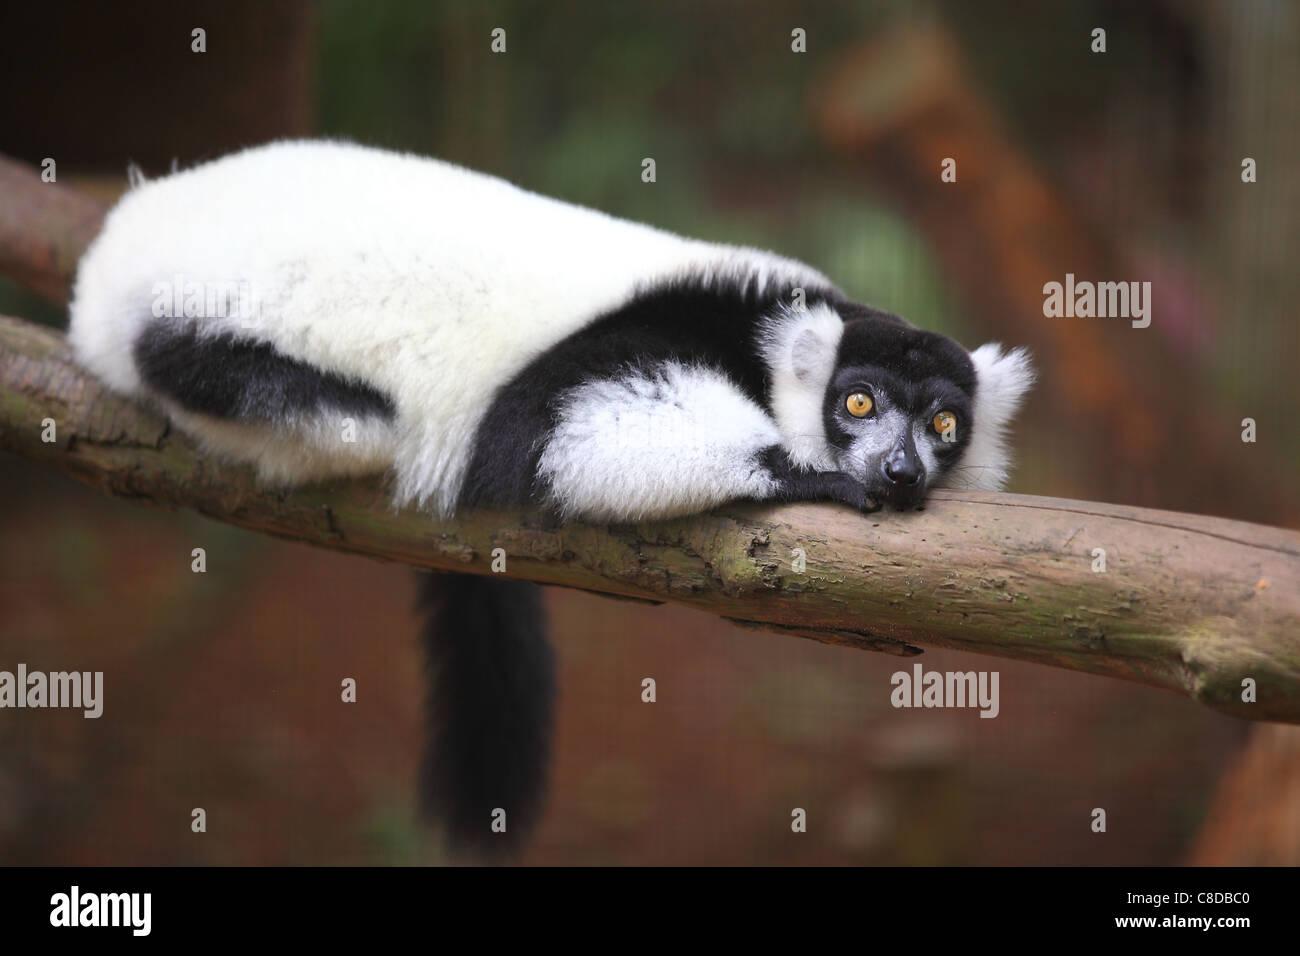 Black-and-white ruffed lemur (Varecia variegata subcincta) resting on a branch in Melaka zoo. - Stock Image